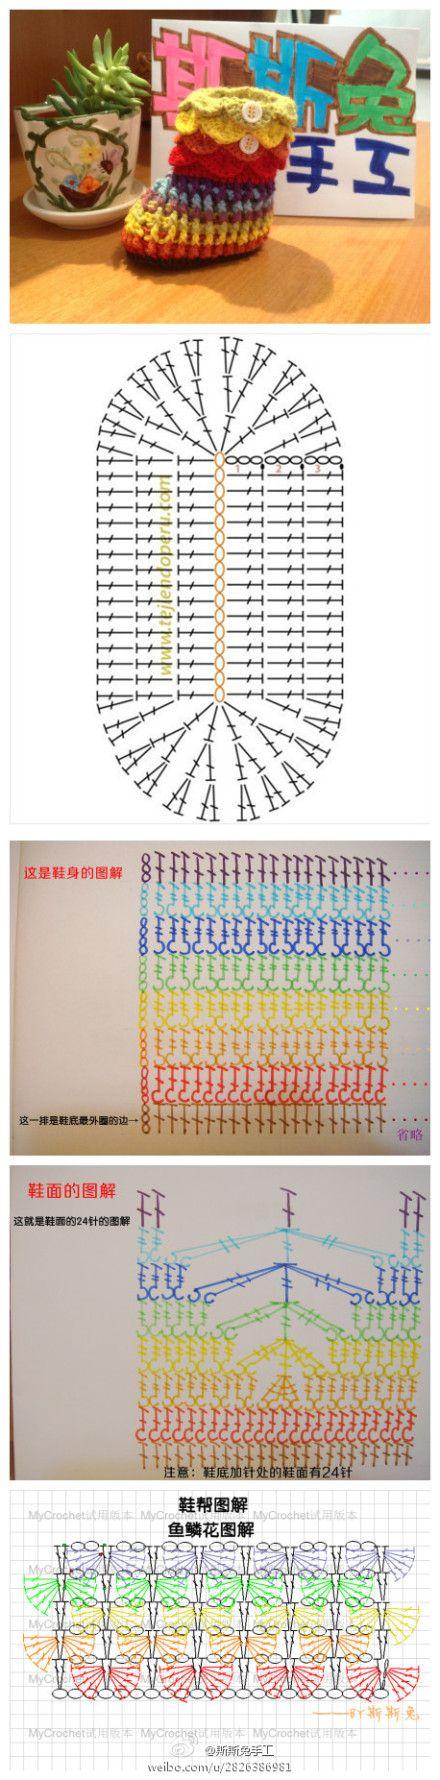 Crochet Booties - Chart | #bebe | Pinterest | Tejido, Zapatos y ...